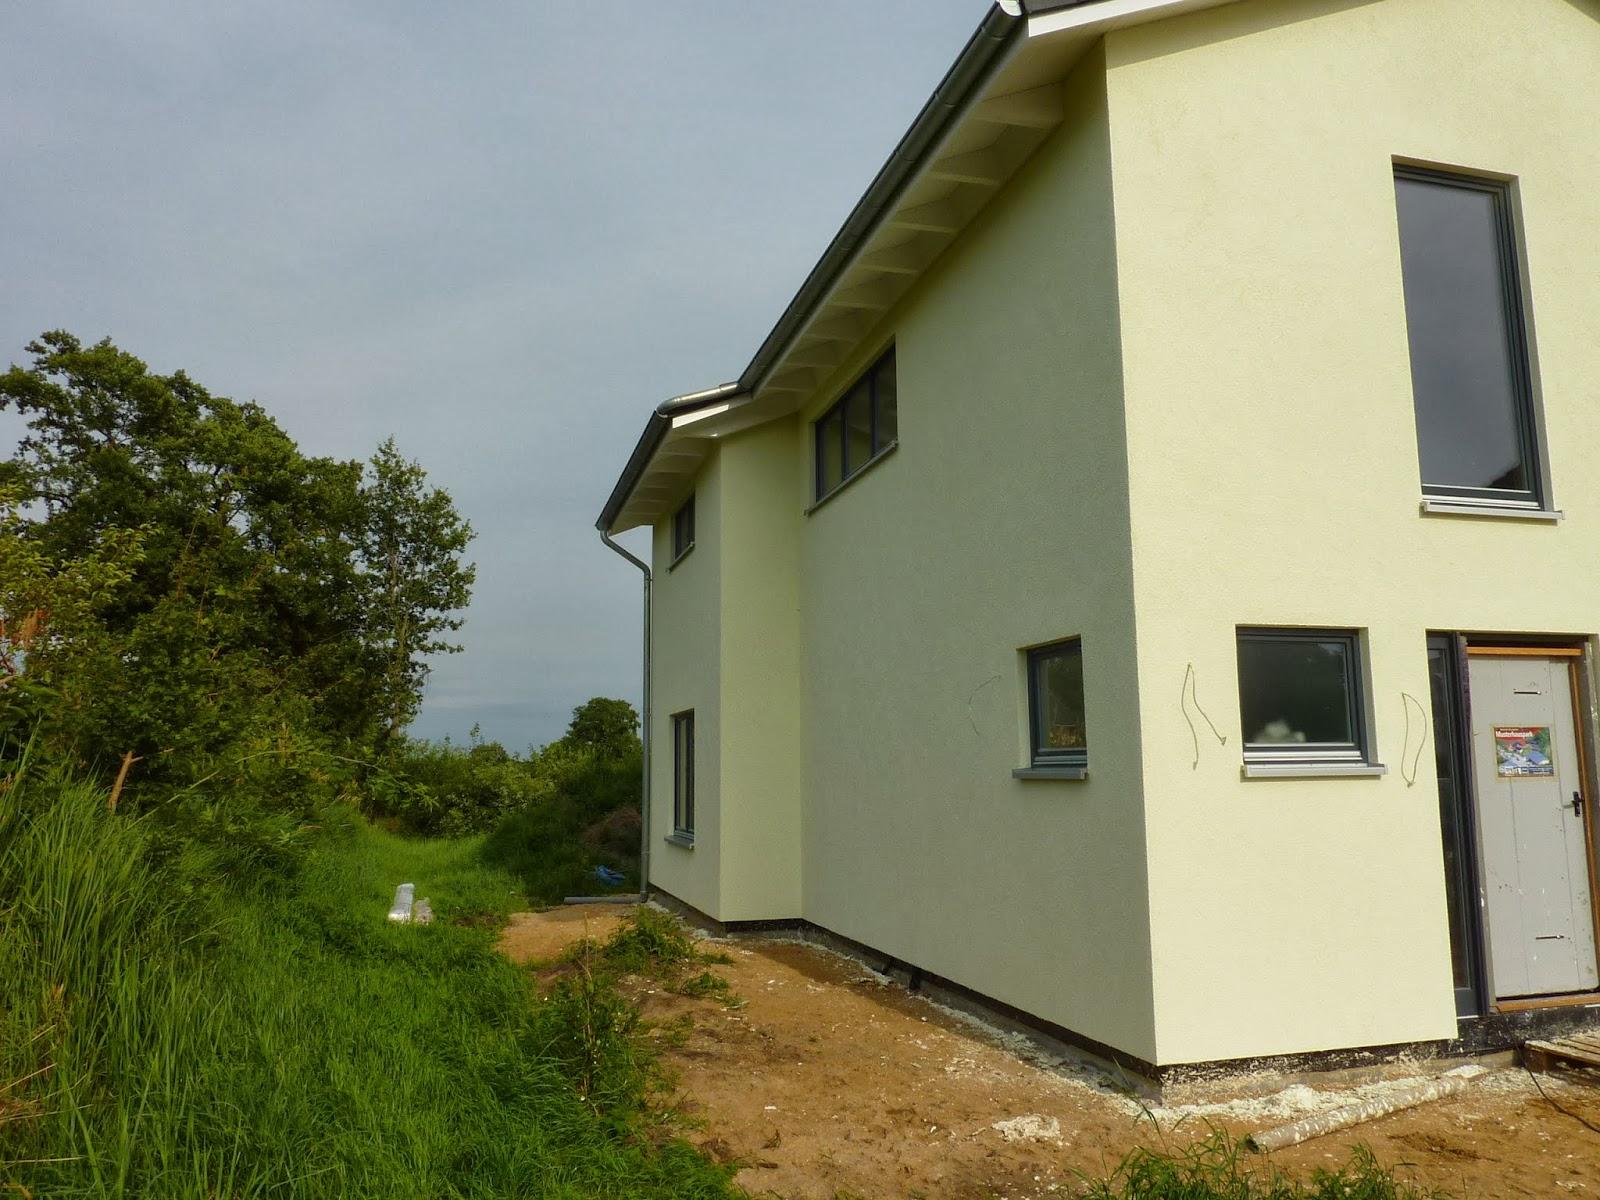 Fassadenfarbe grüntöne  Unser Eichhörnchen-Haus: Fassade fertig! Juhu!